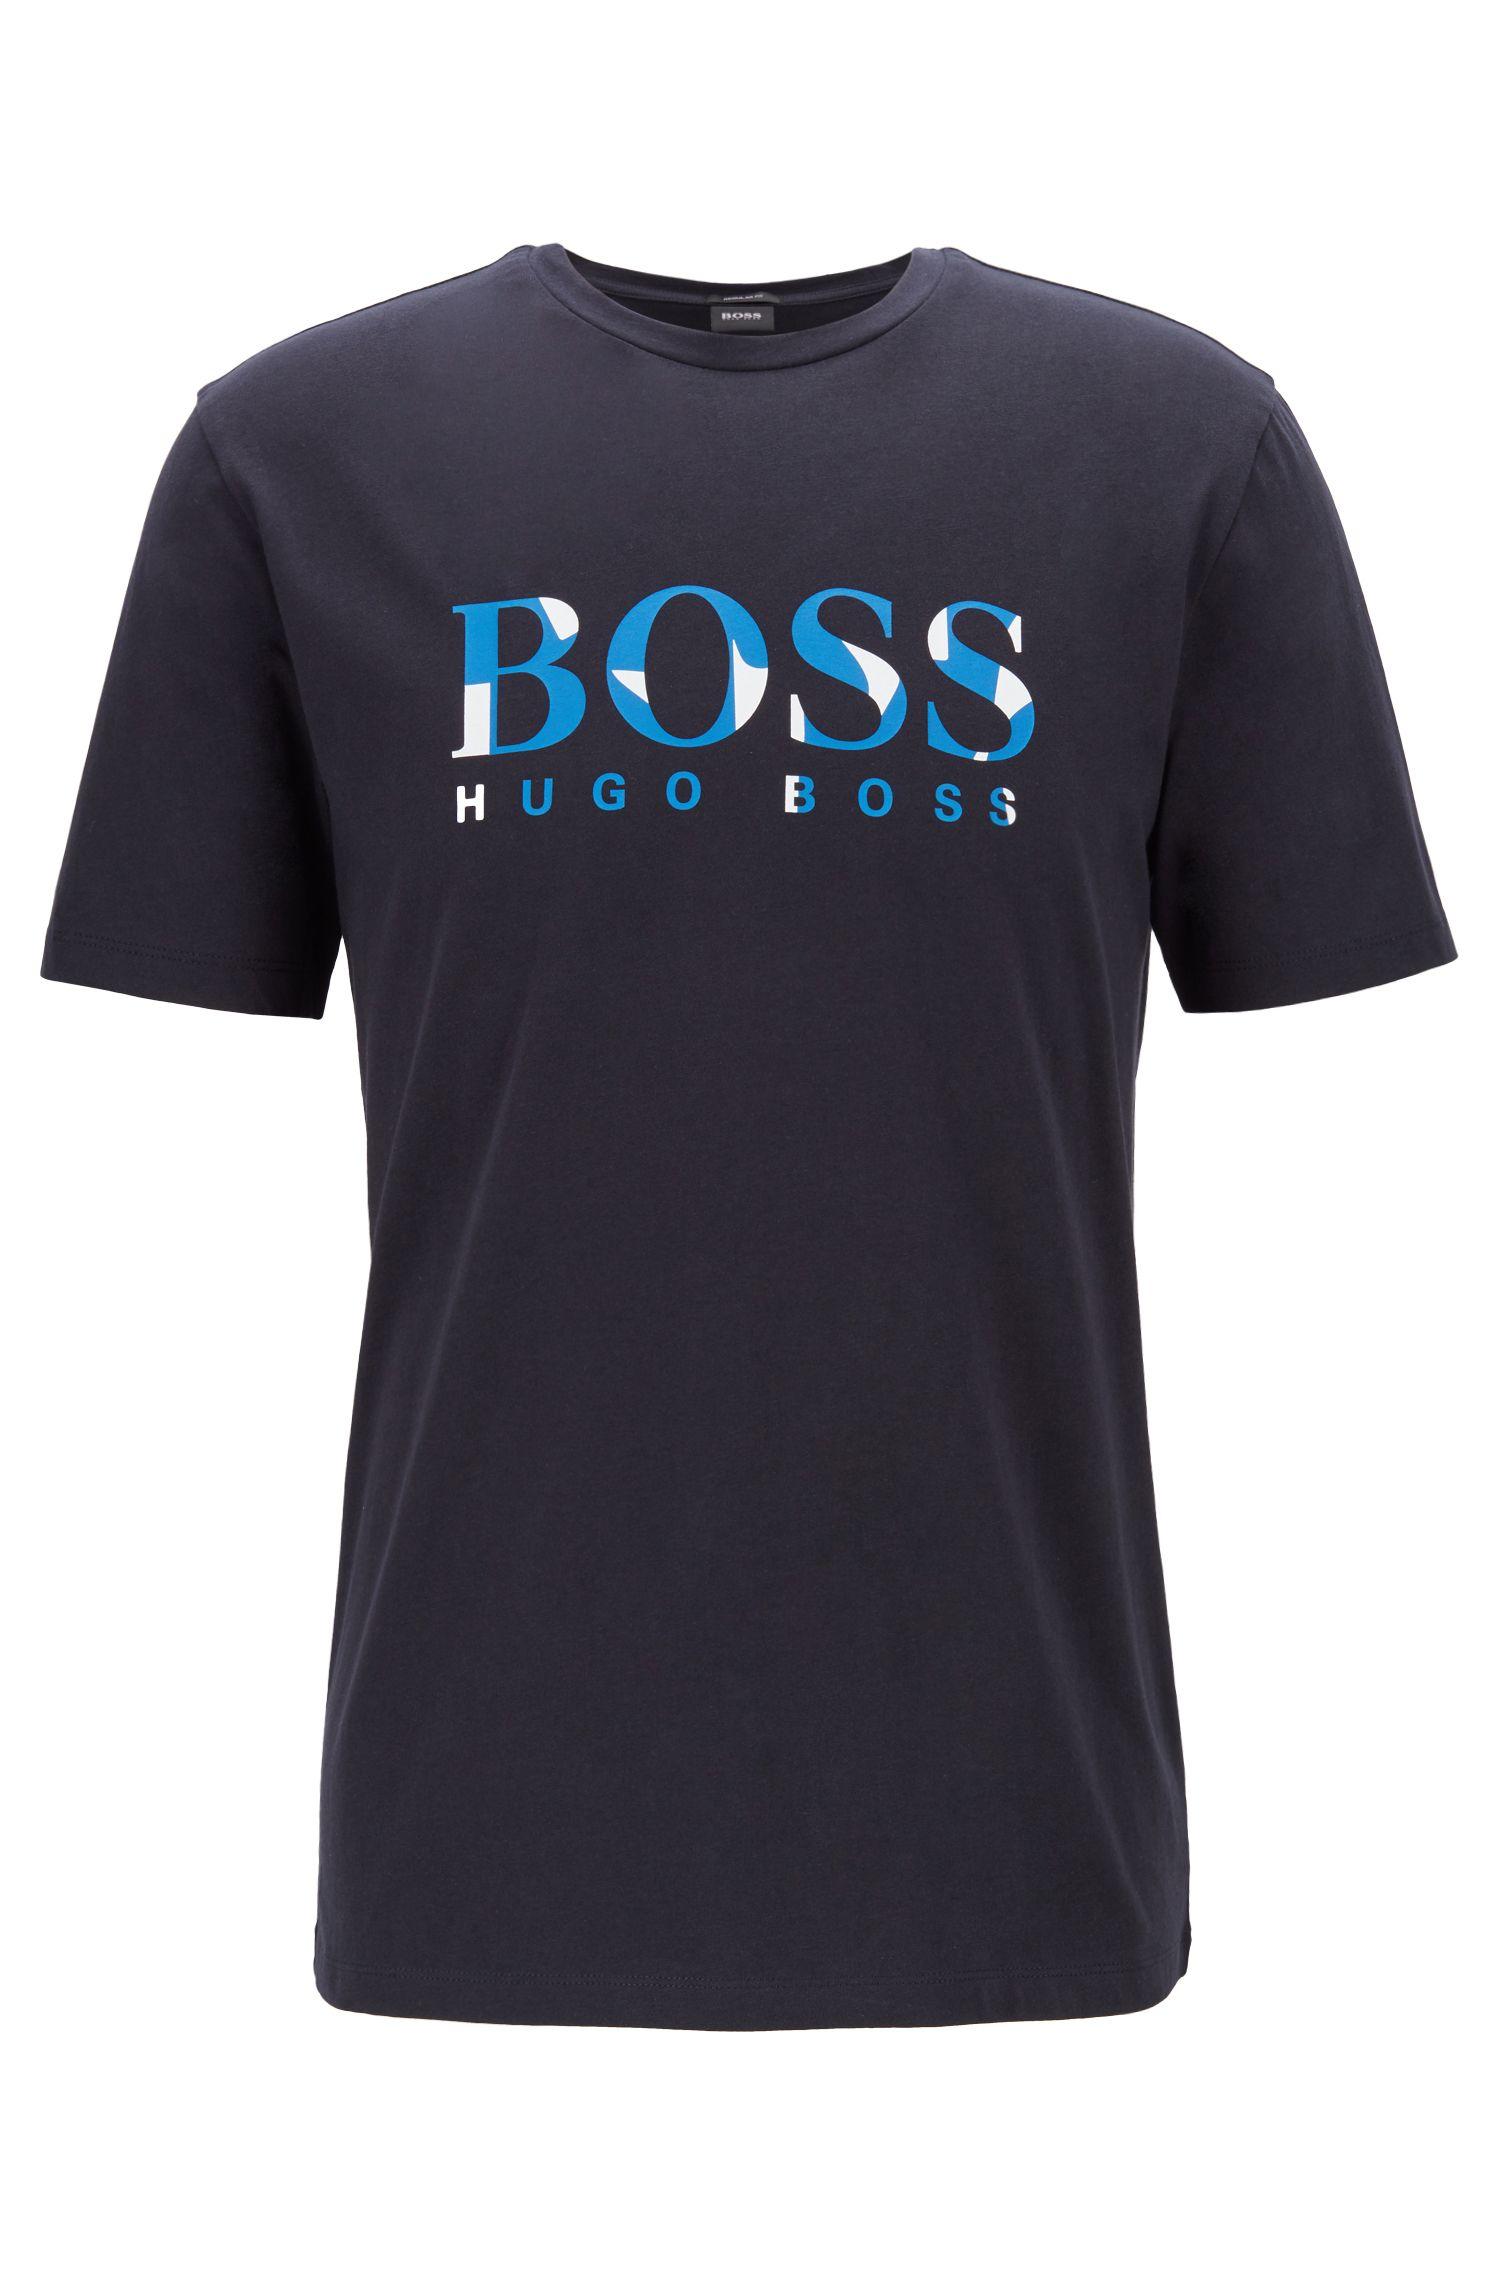 Crew-neck T-shirt in cotton with floral logo print, Dark Blue